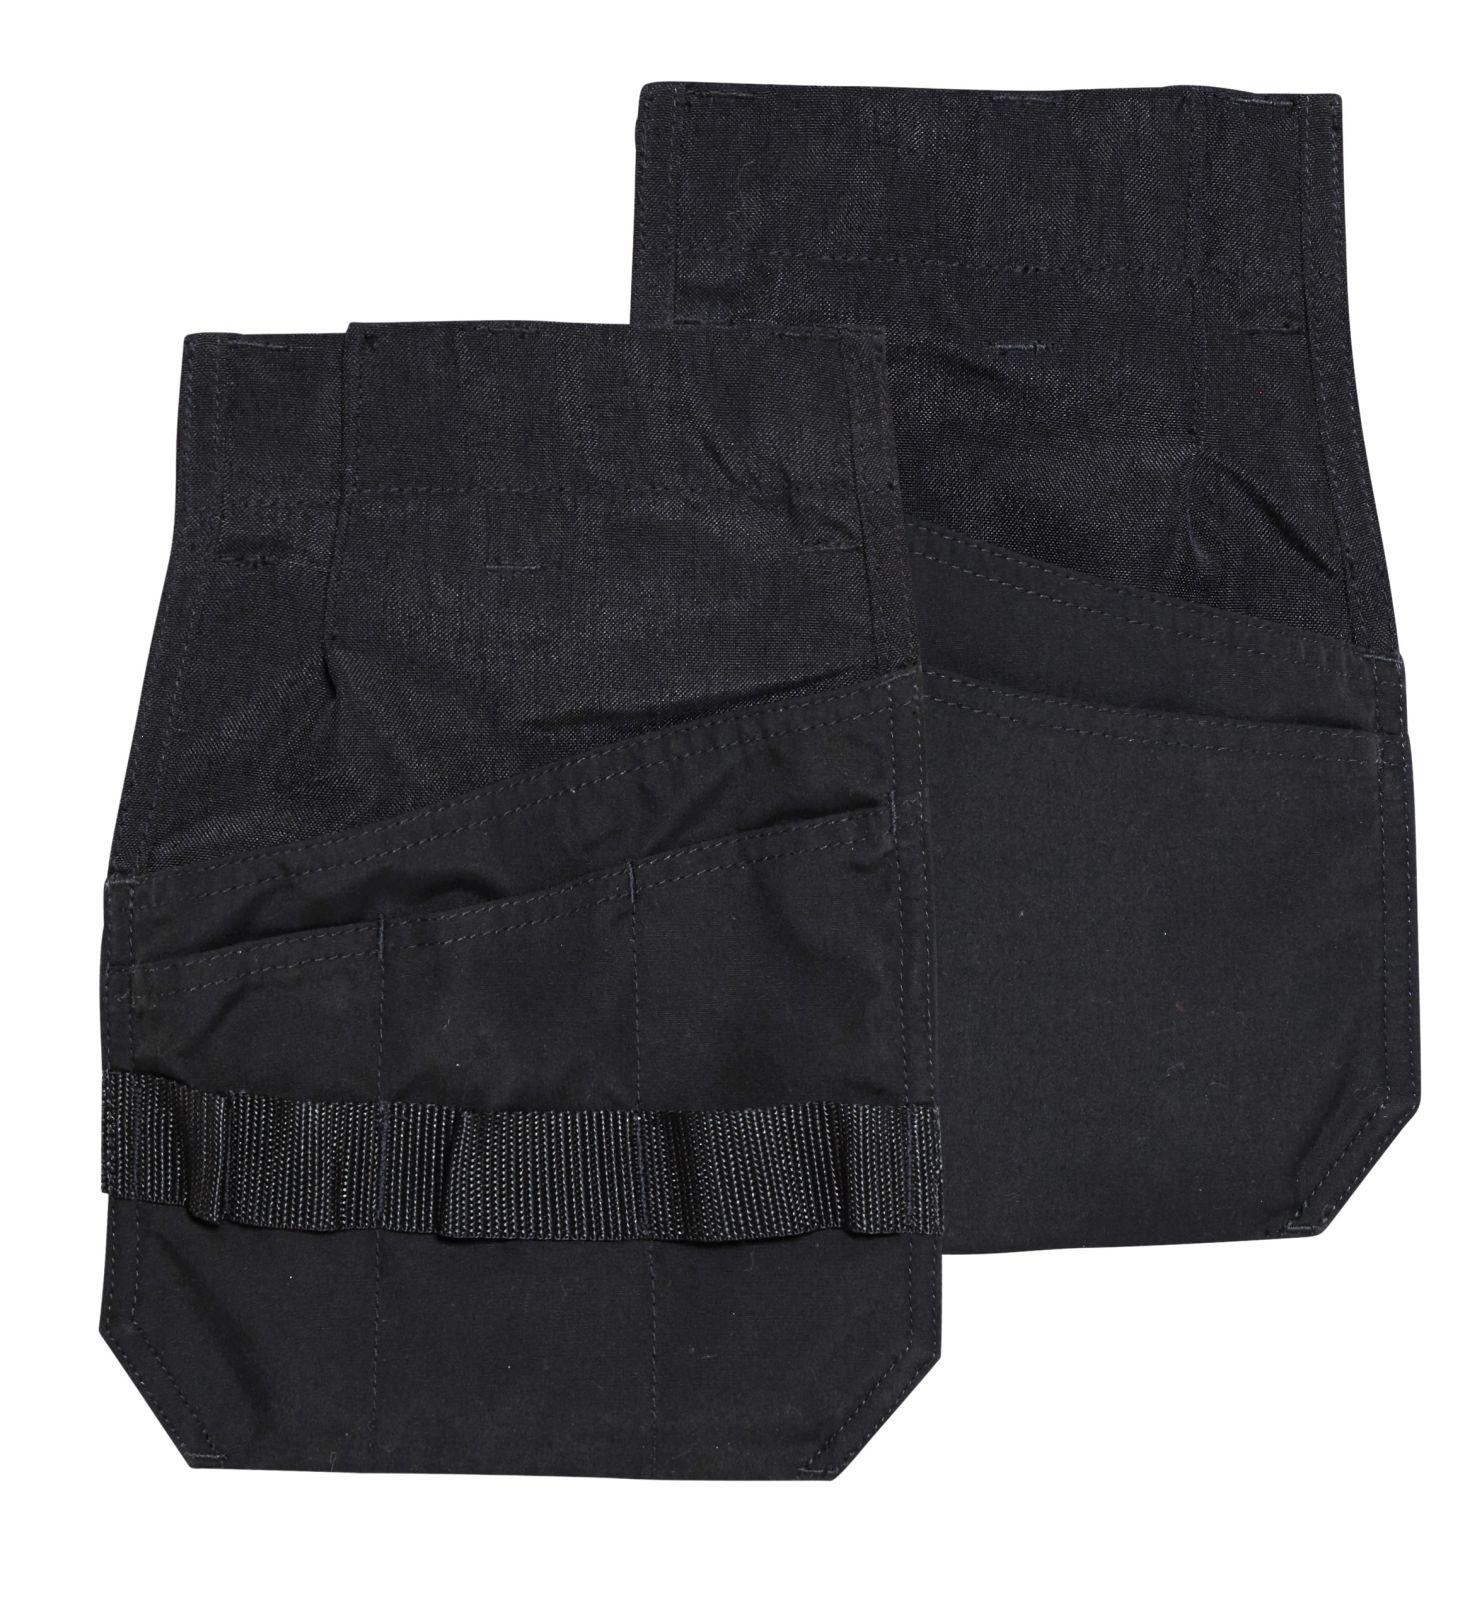 Blaklader Swingpockets 21591845 zwart(9900)